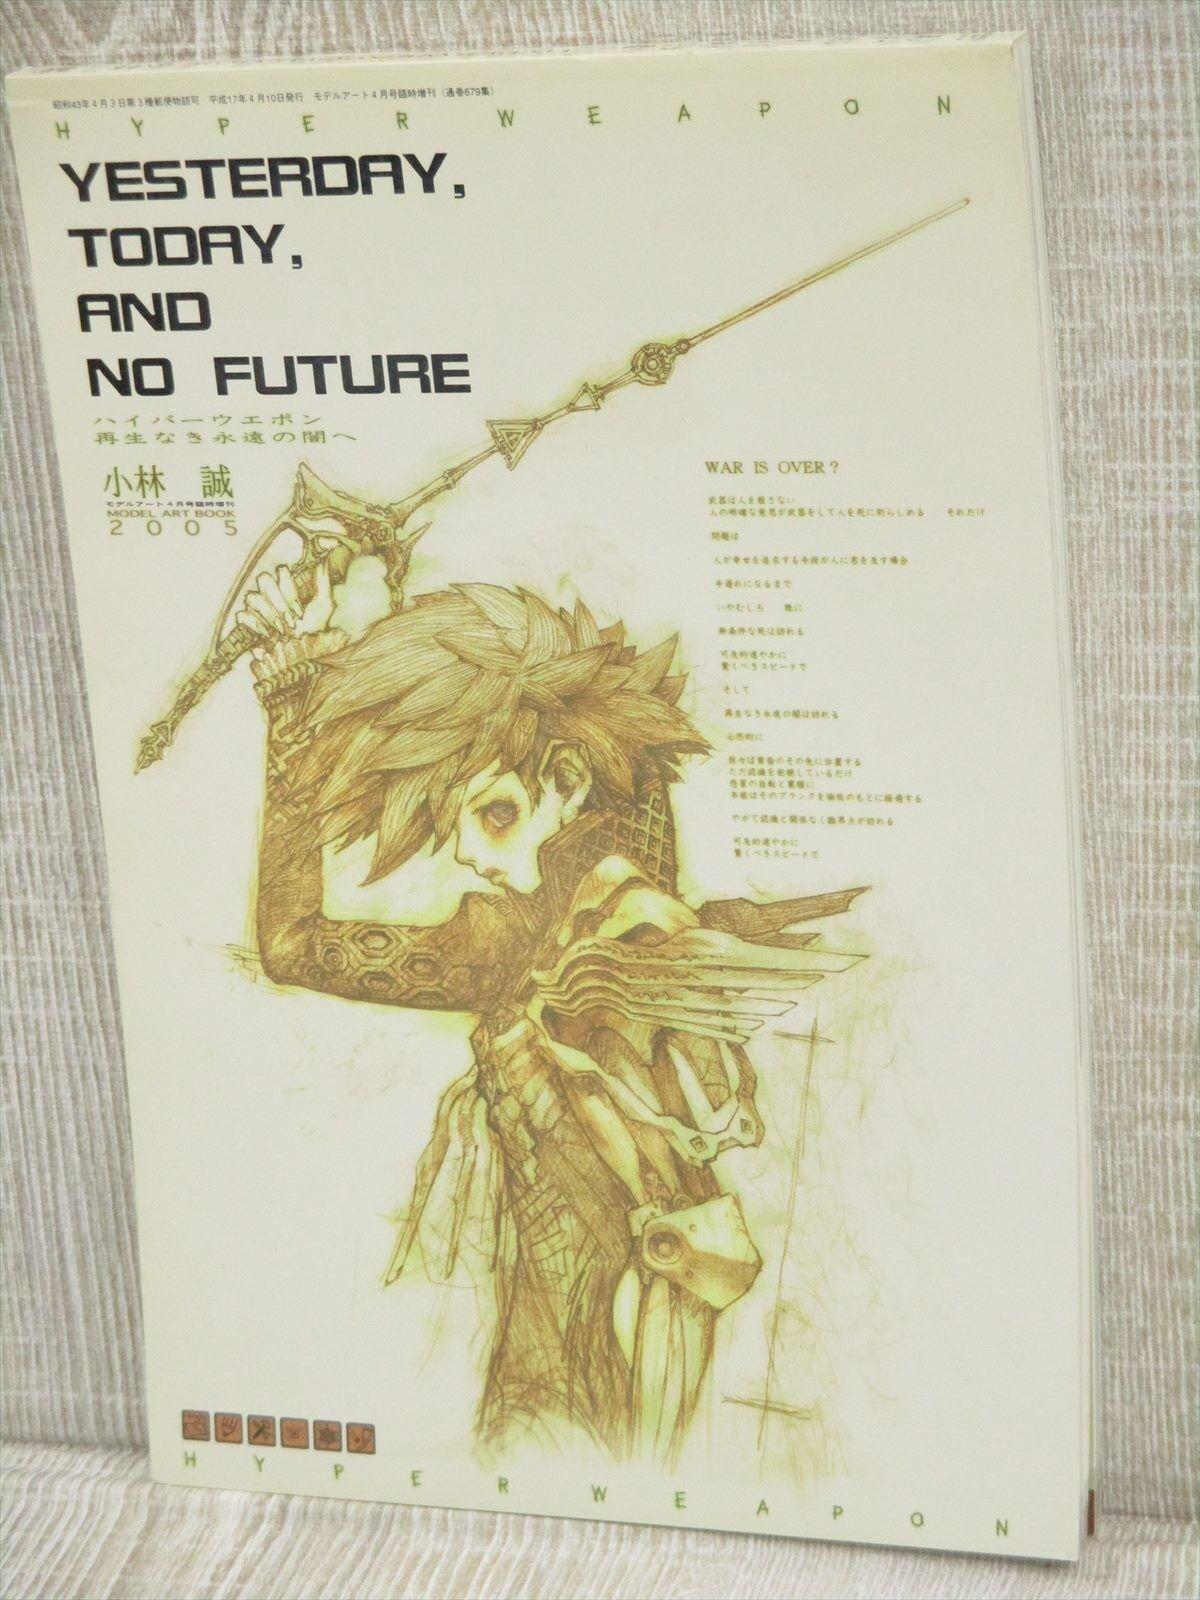 HYPER WEAPON 2005 Art Illustration MAKOTO KOBAYASHI Book